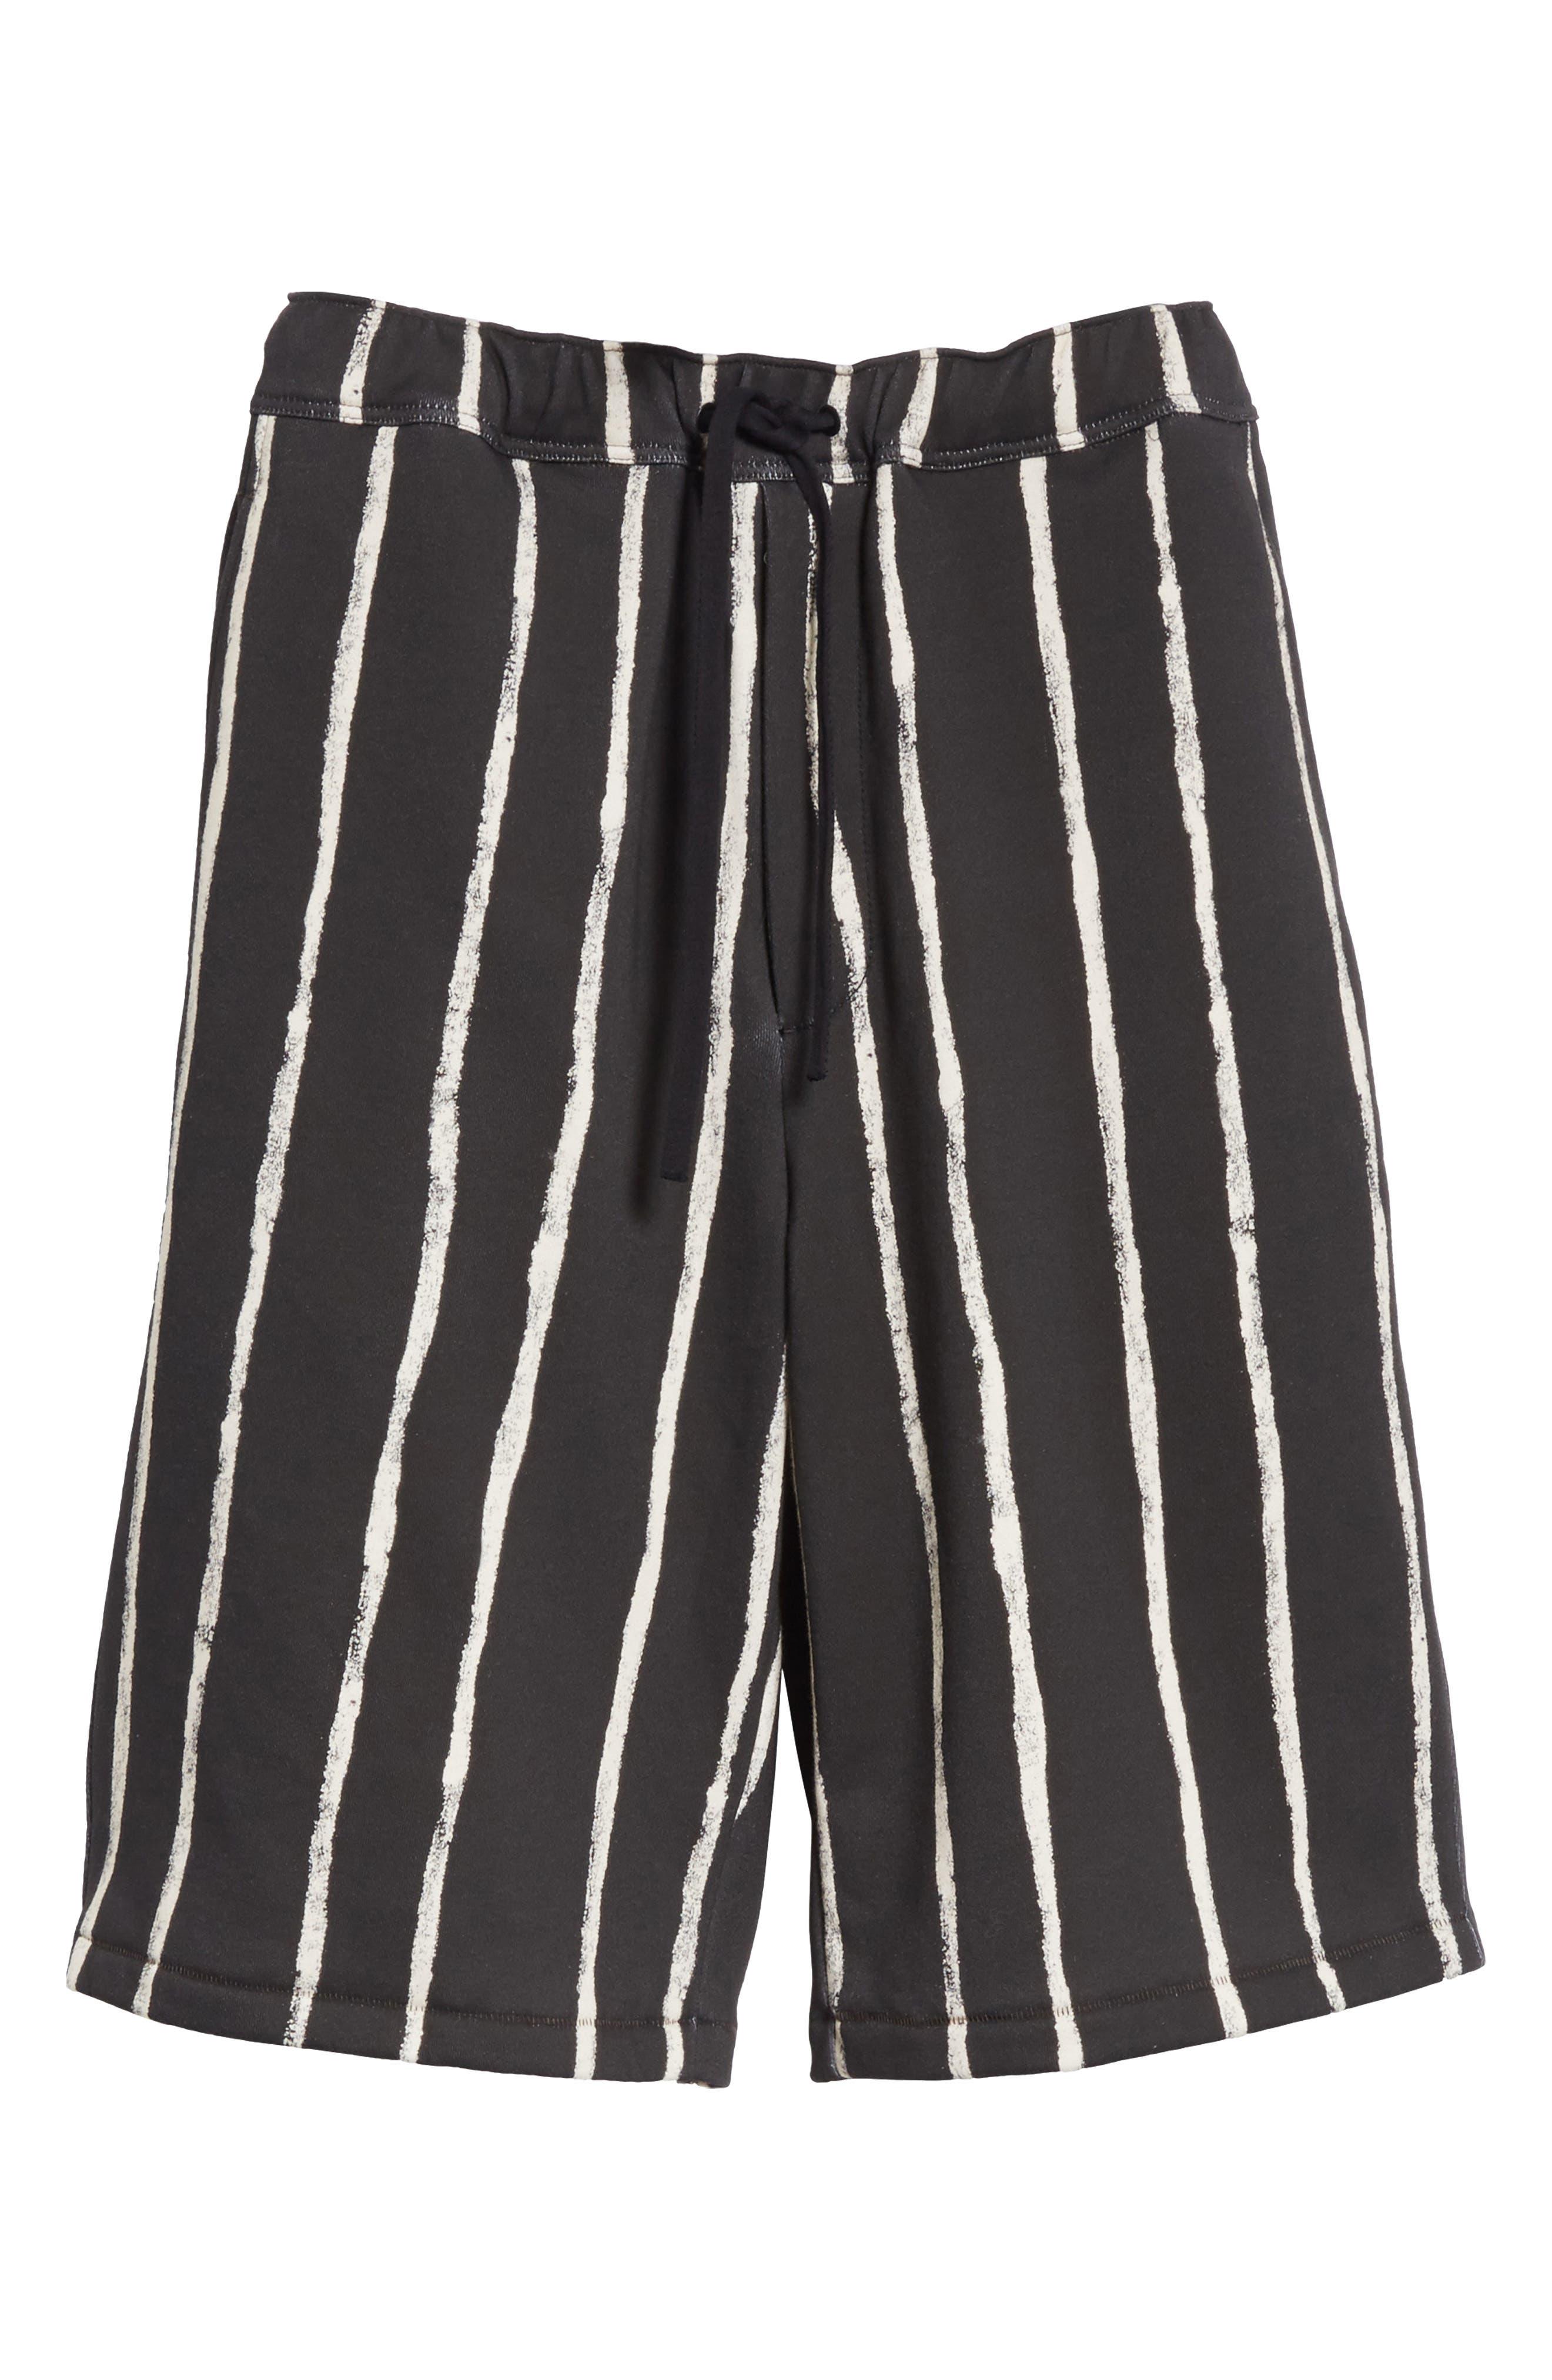 Striped Paint Shorts,                             Alternate thumbnail 6, color,                             001